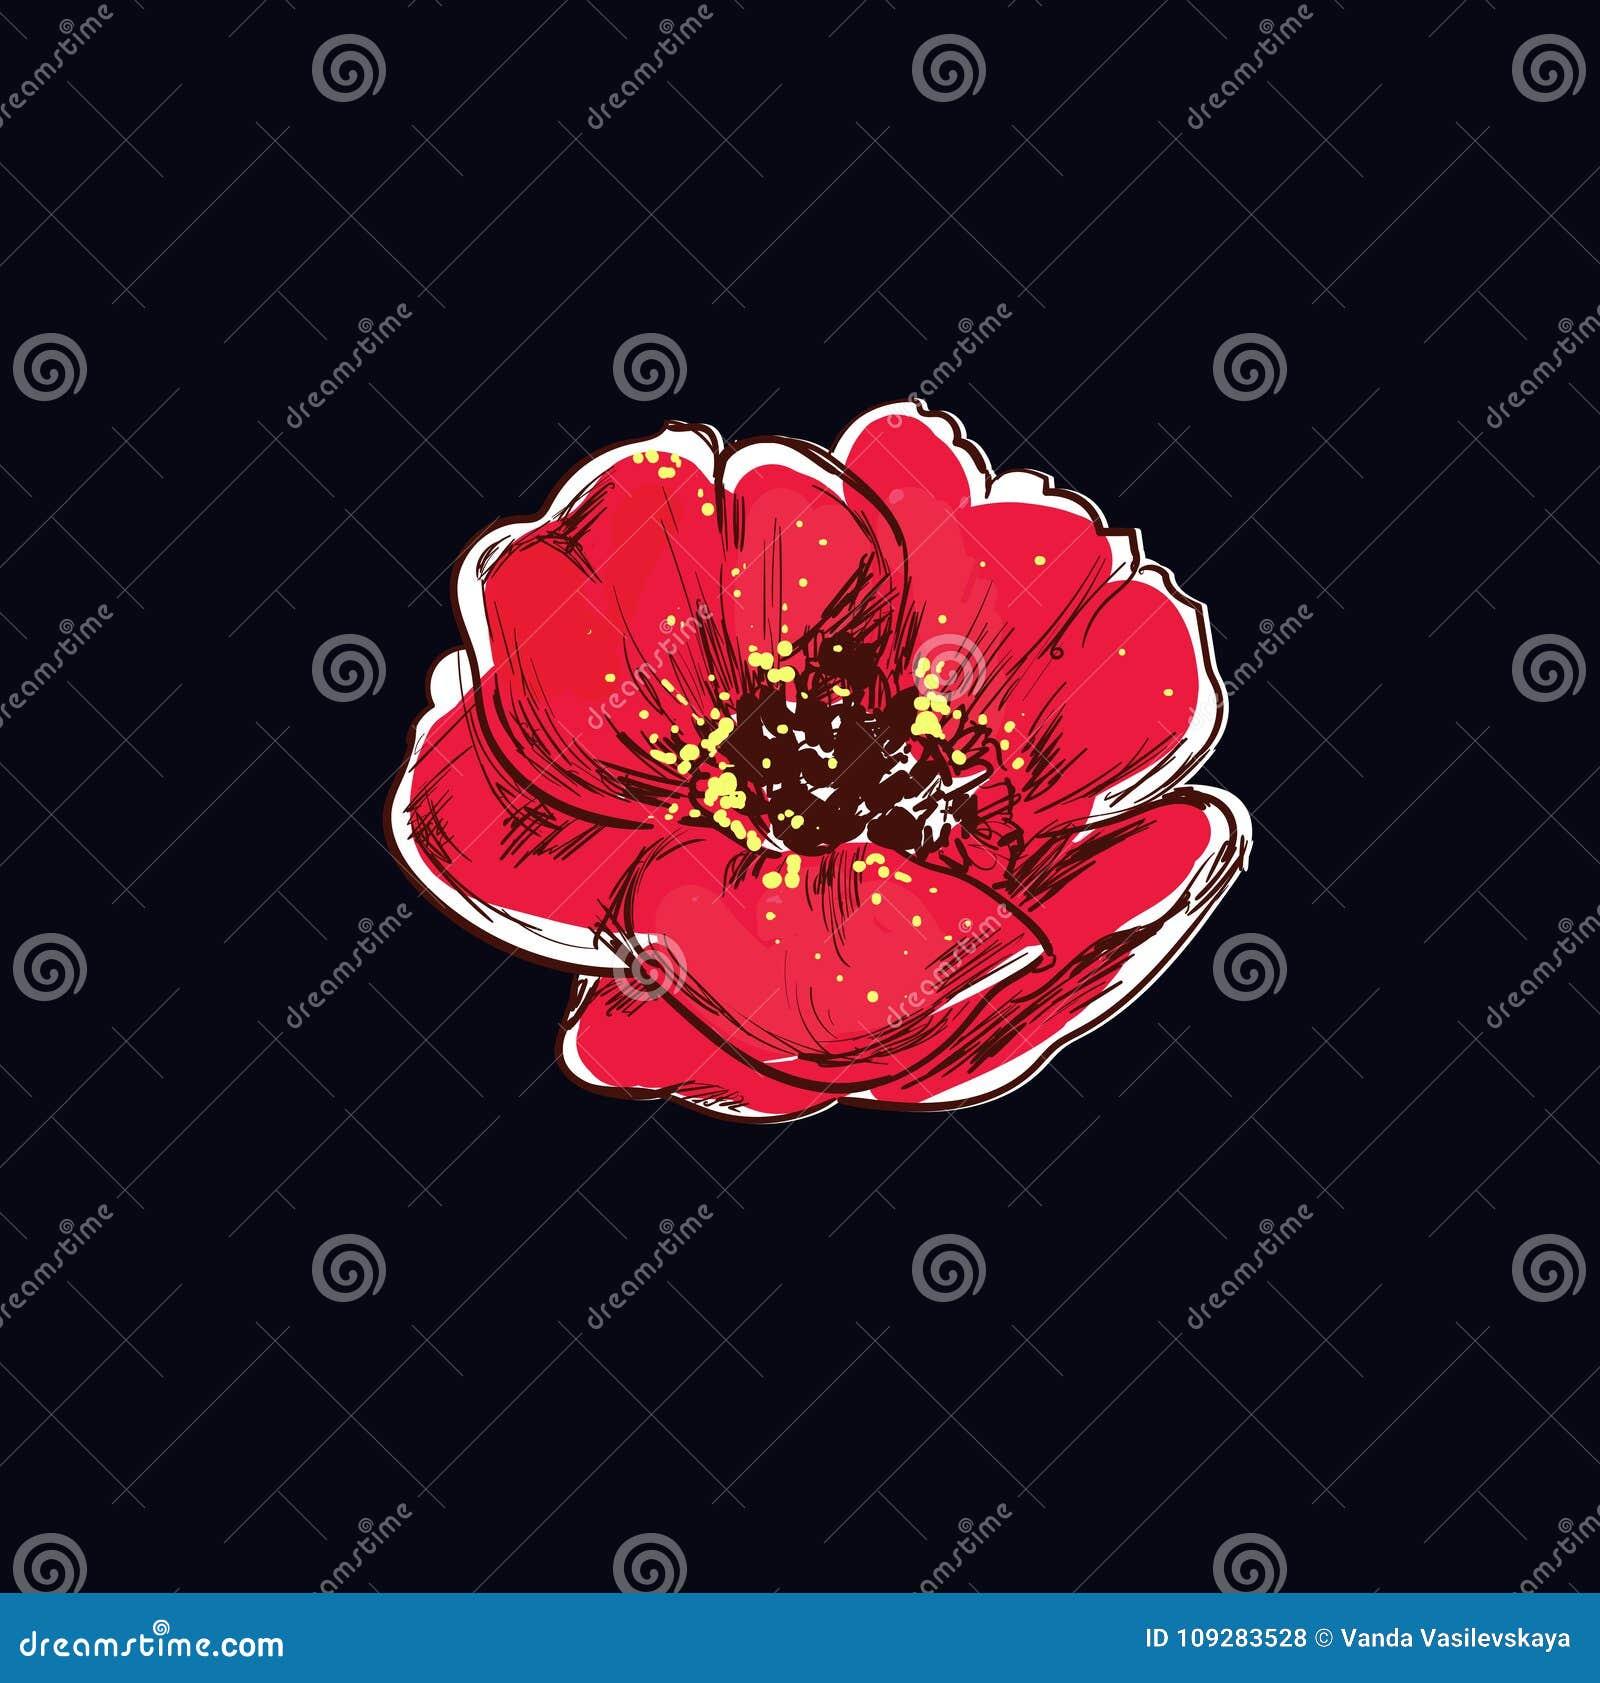 Poppy Flower Tattoo Stock Vector Illustration Of Fashion 109283528